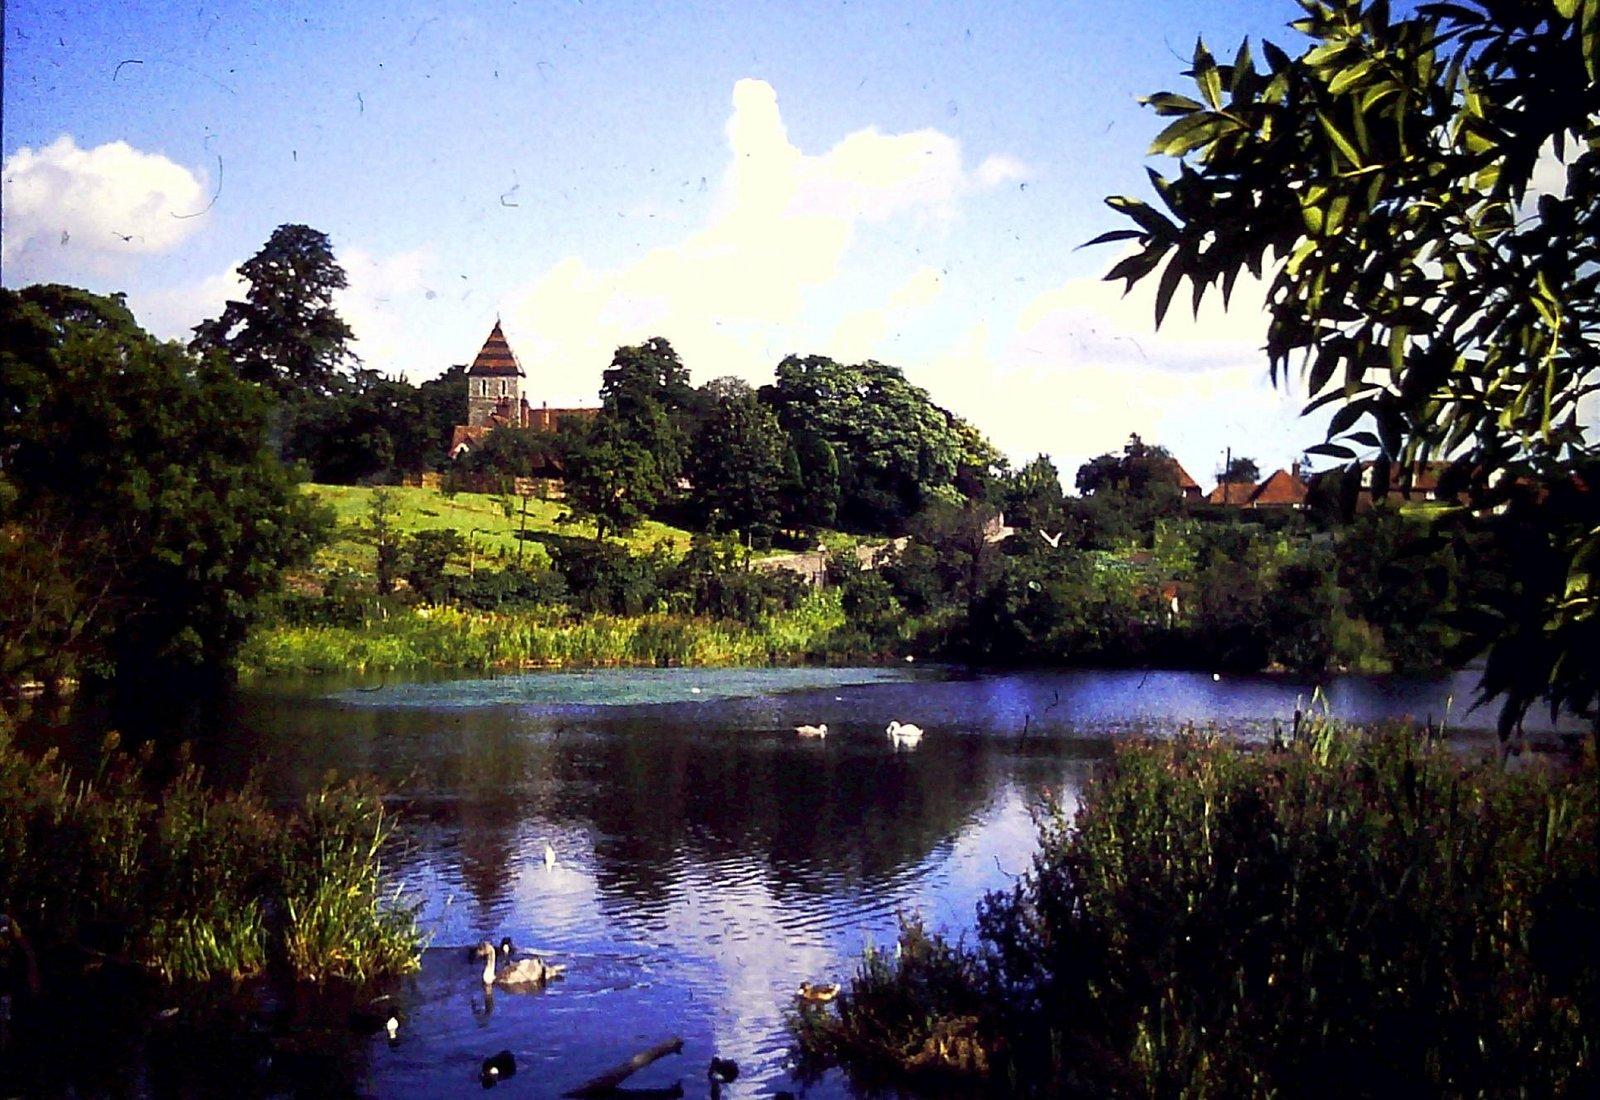 Stonebridge Pond & Davington's 1153 Priory Church